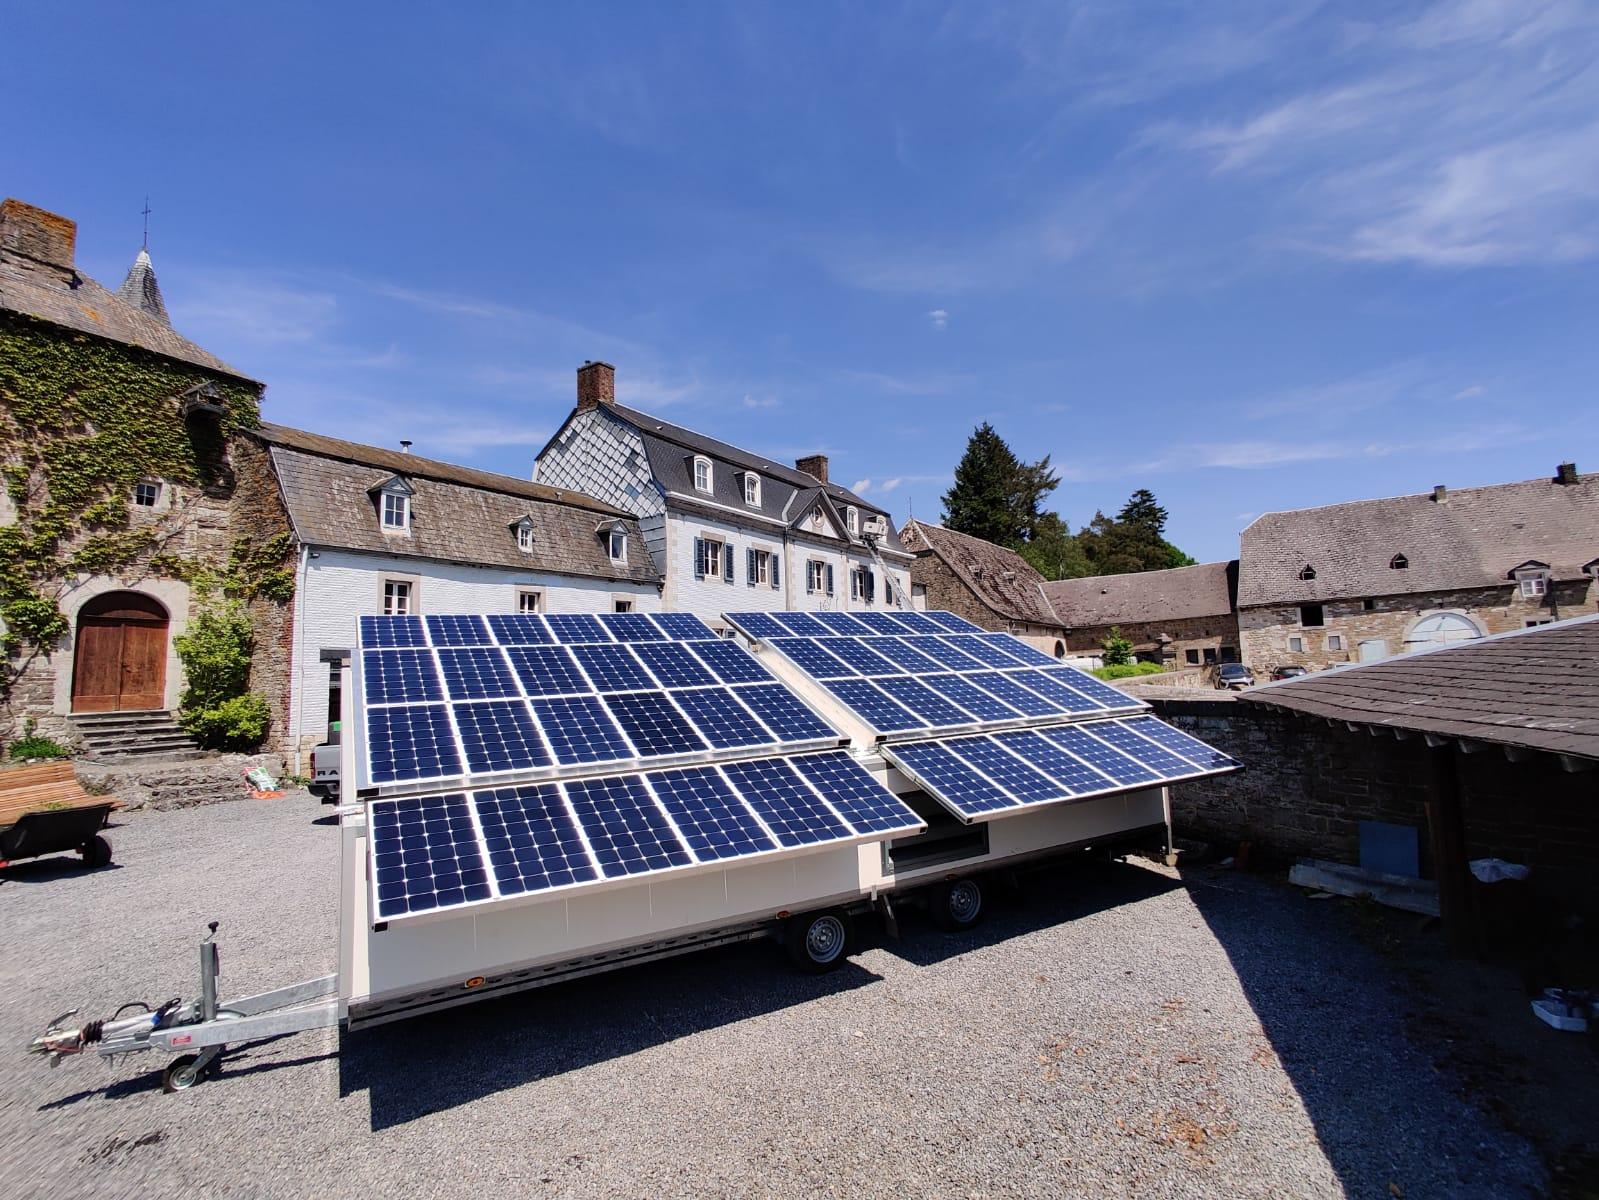 Duurzame energievoorziening: hoe duurzaam is zonne-energie?